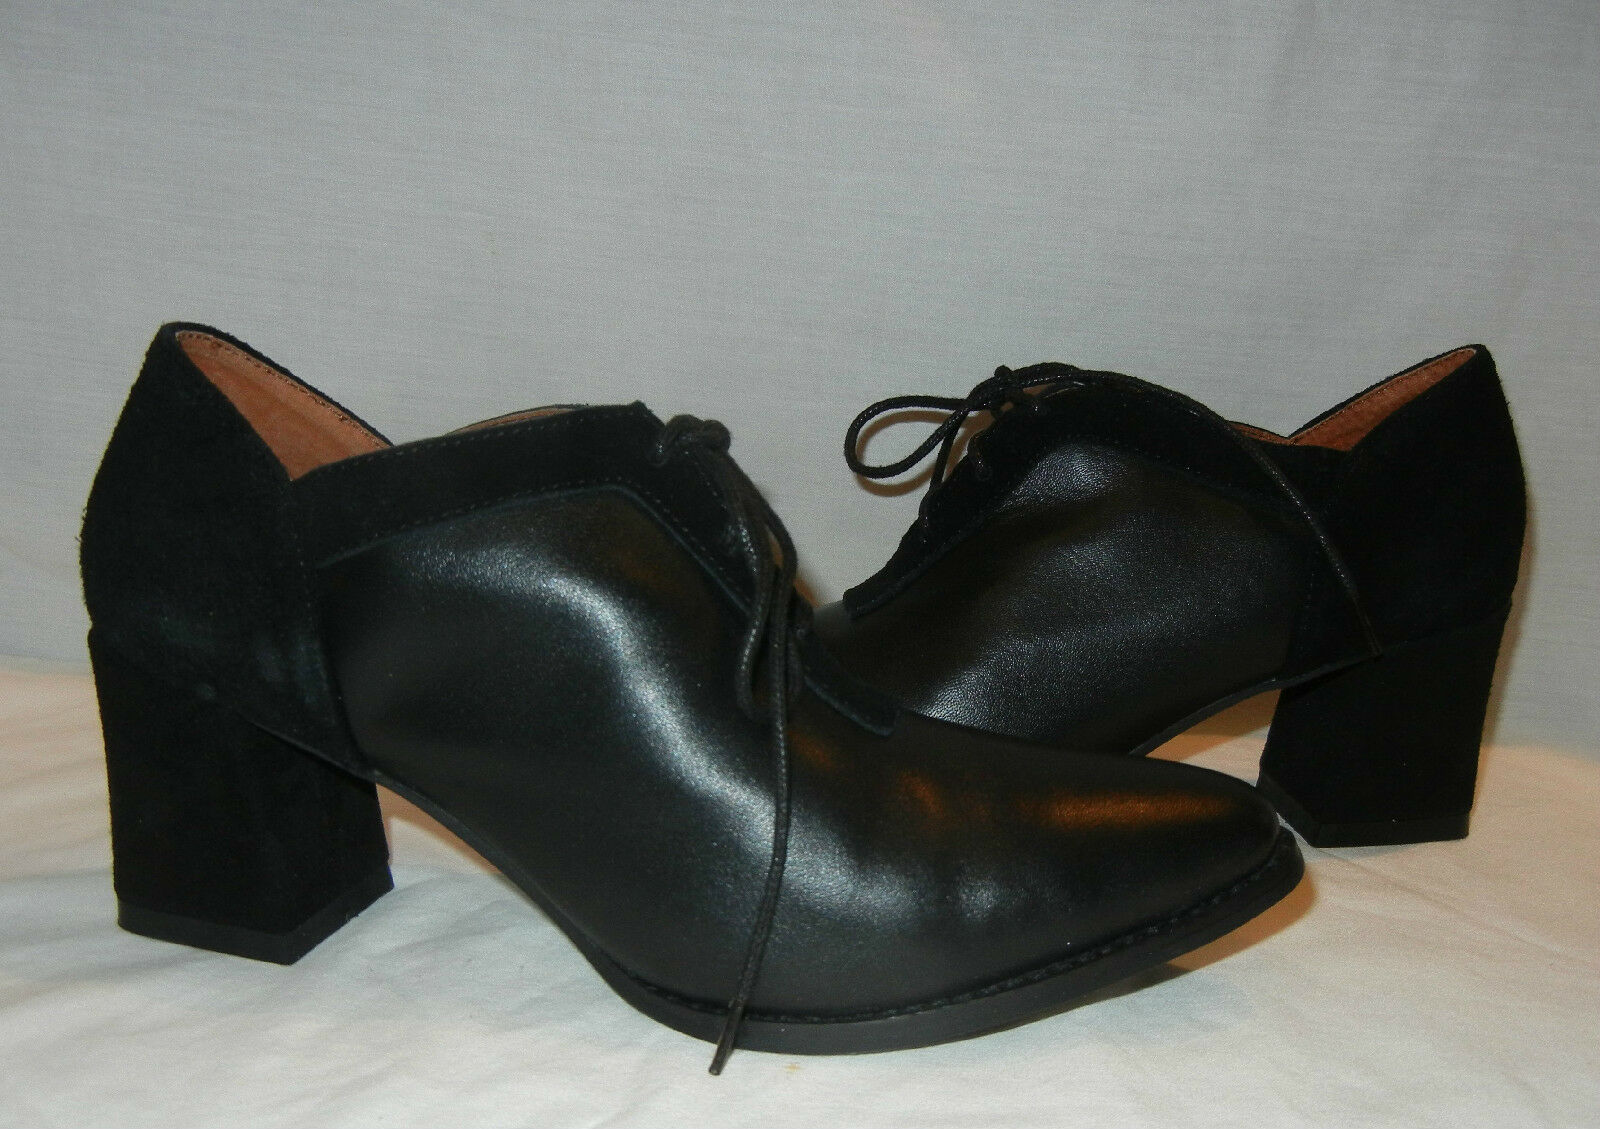 Kobe Husk Women's Hankster Black Leather Lace Up Heels Retail  170 size 9